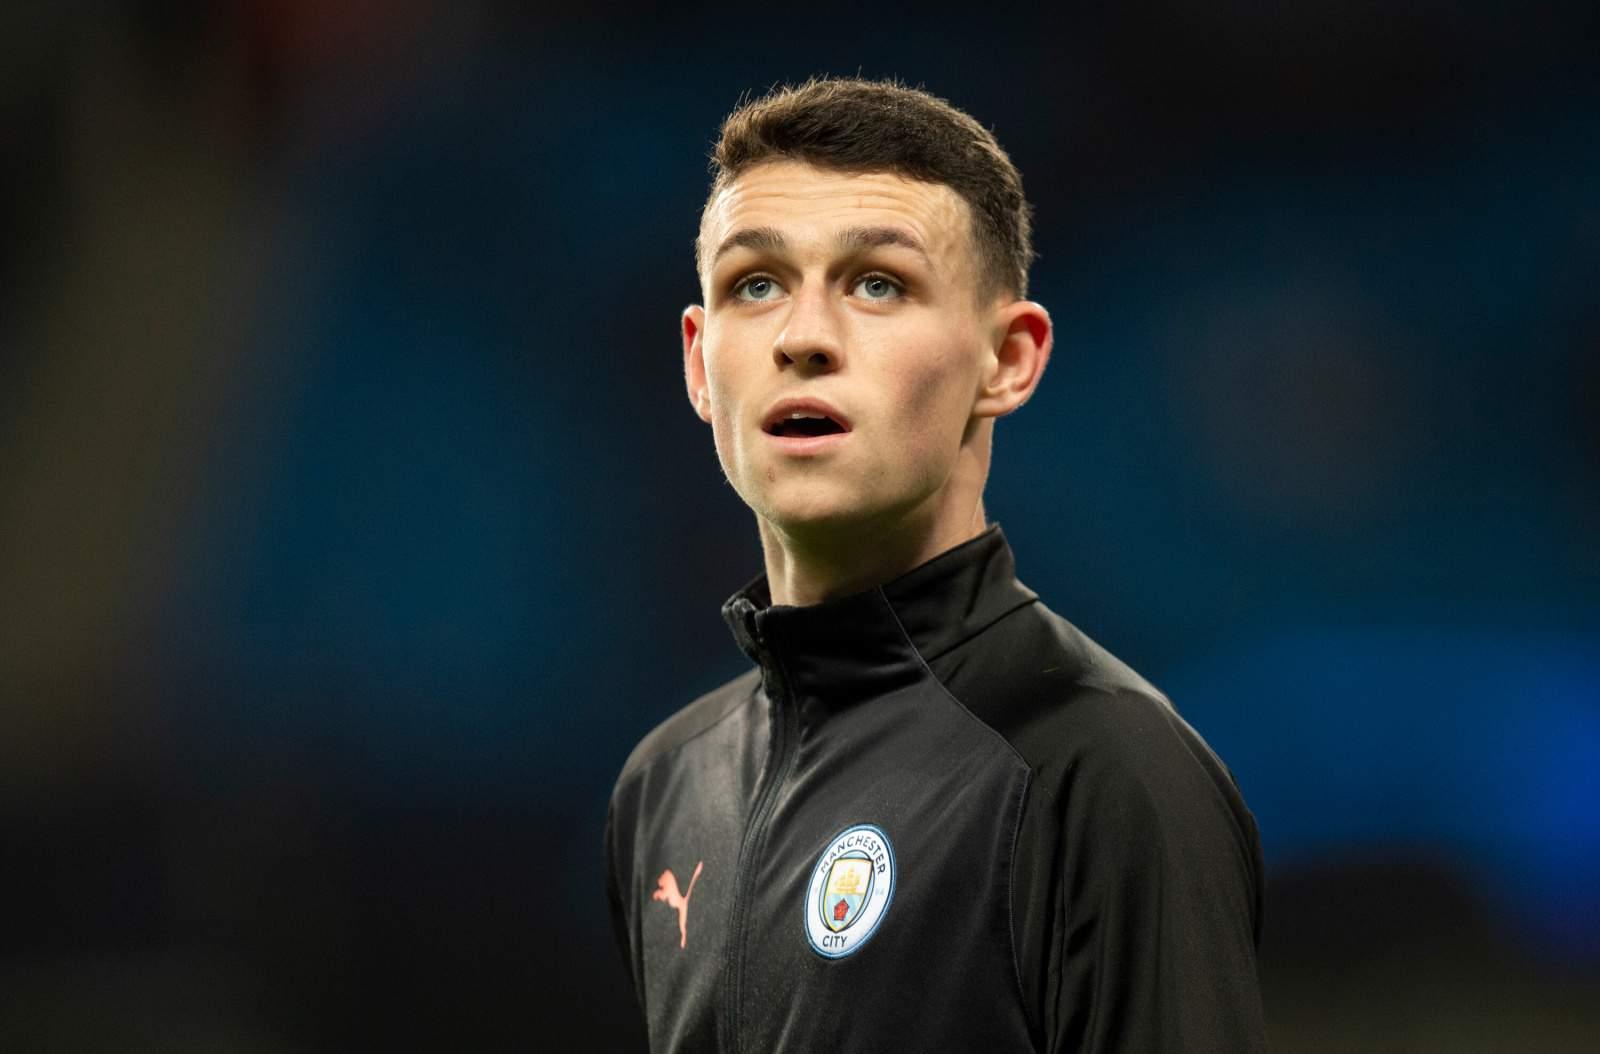 Фоден недоволен своим положением в «Манчестер Сити»